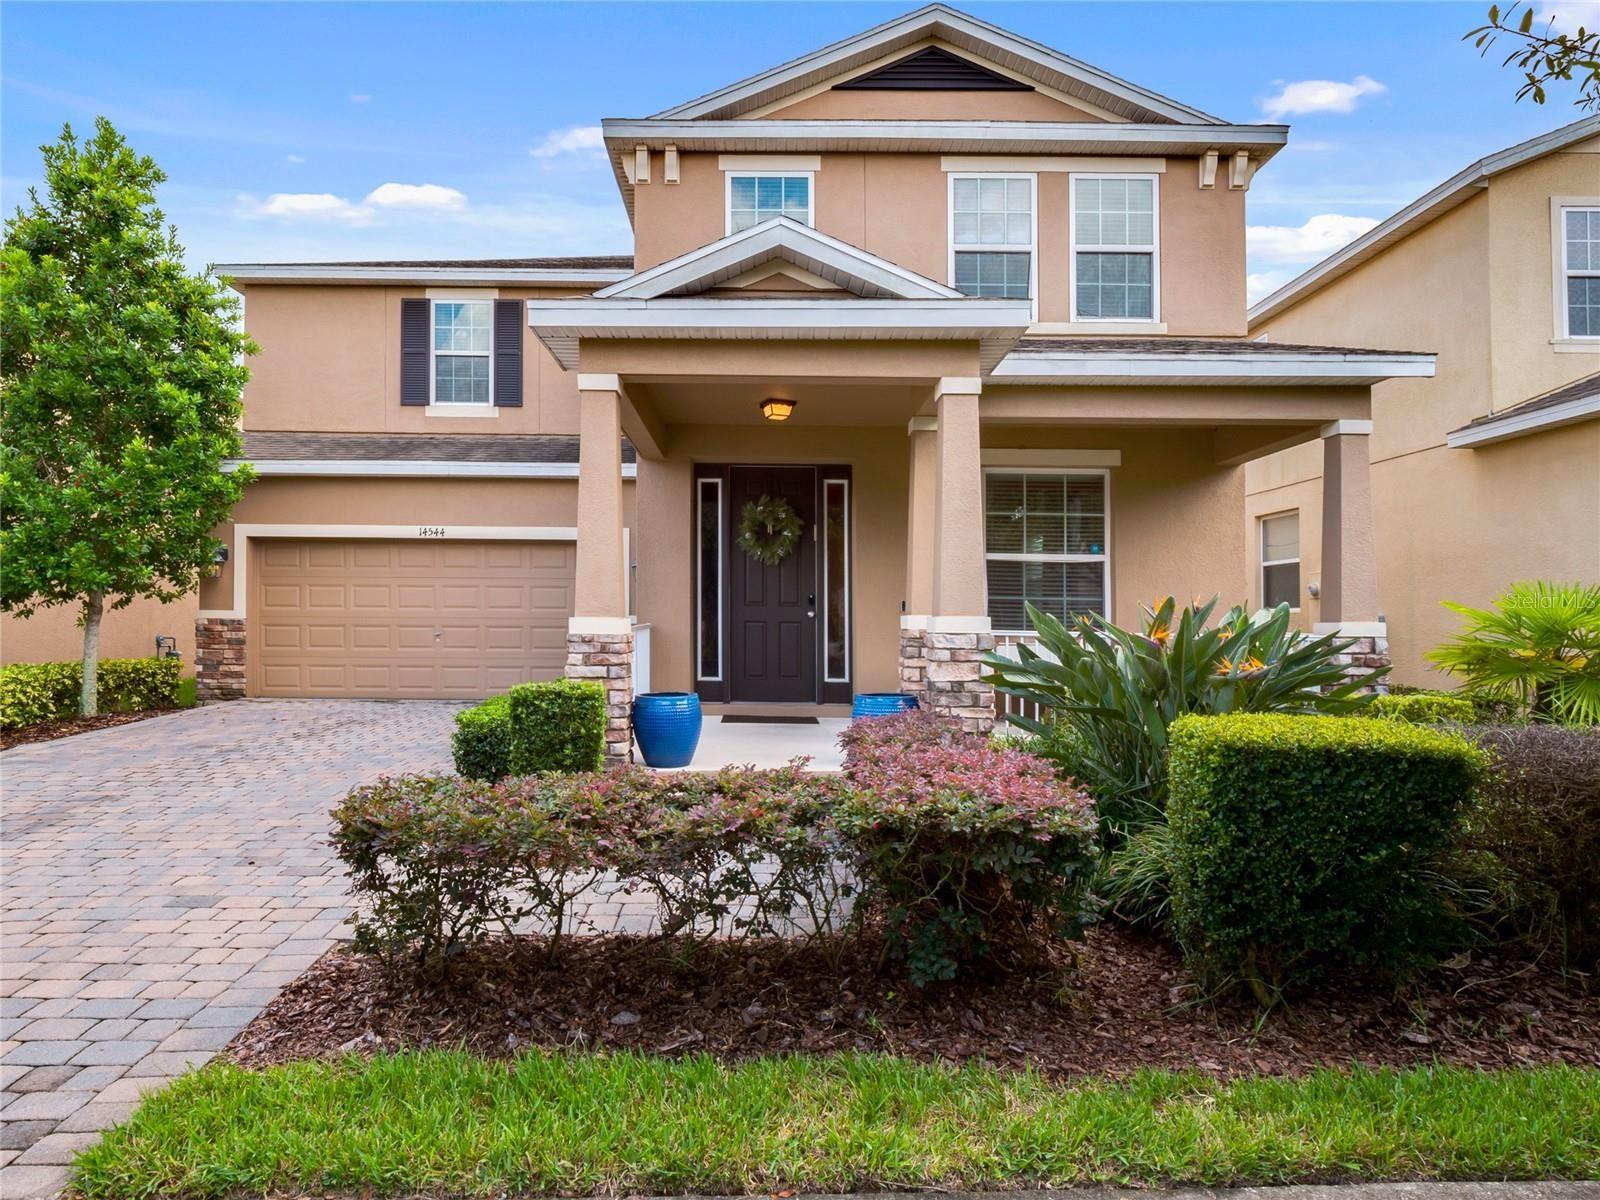 14544 SPOTTED SANDPIPER BOULEVARD, Winter Garden, FL 34787 - #: O5975006